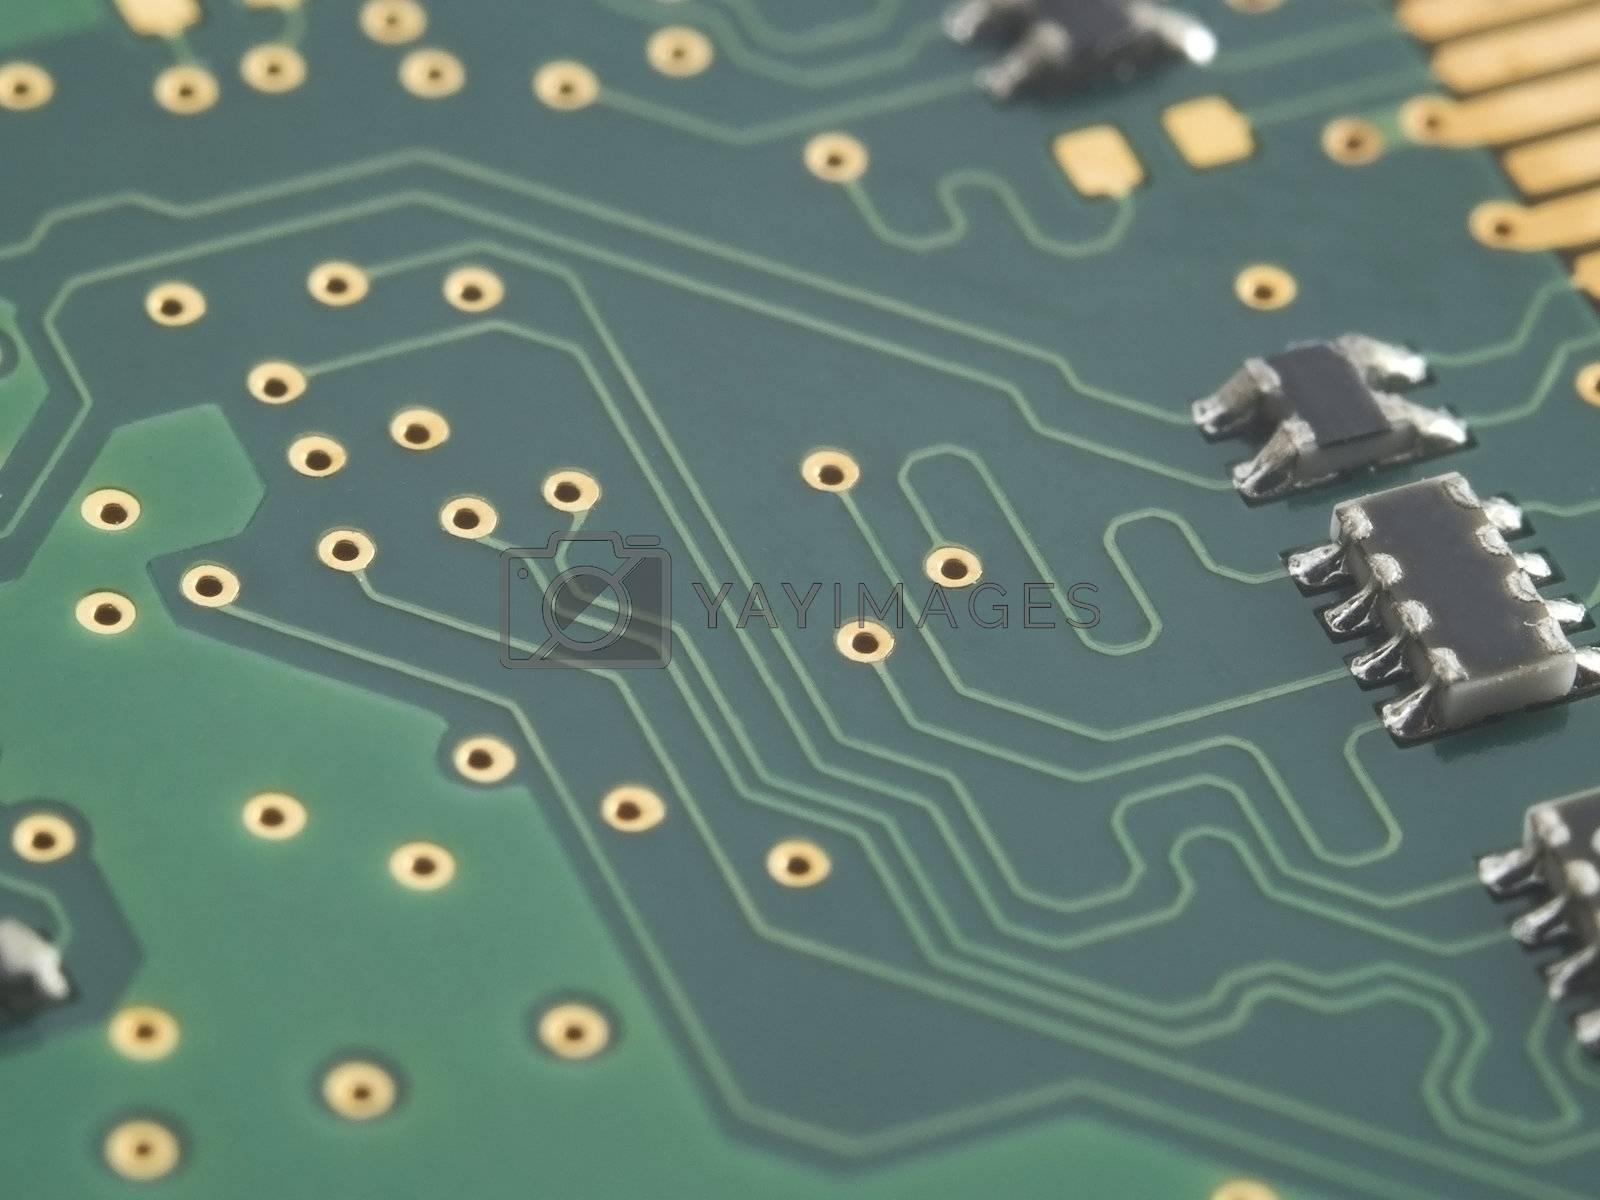 Electronic circuit board by epixx